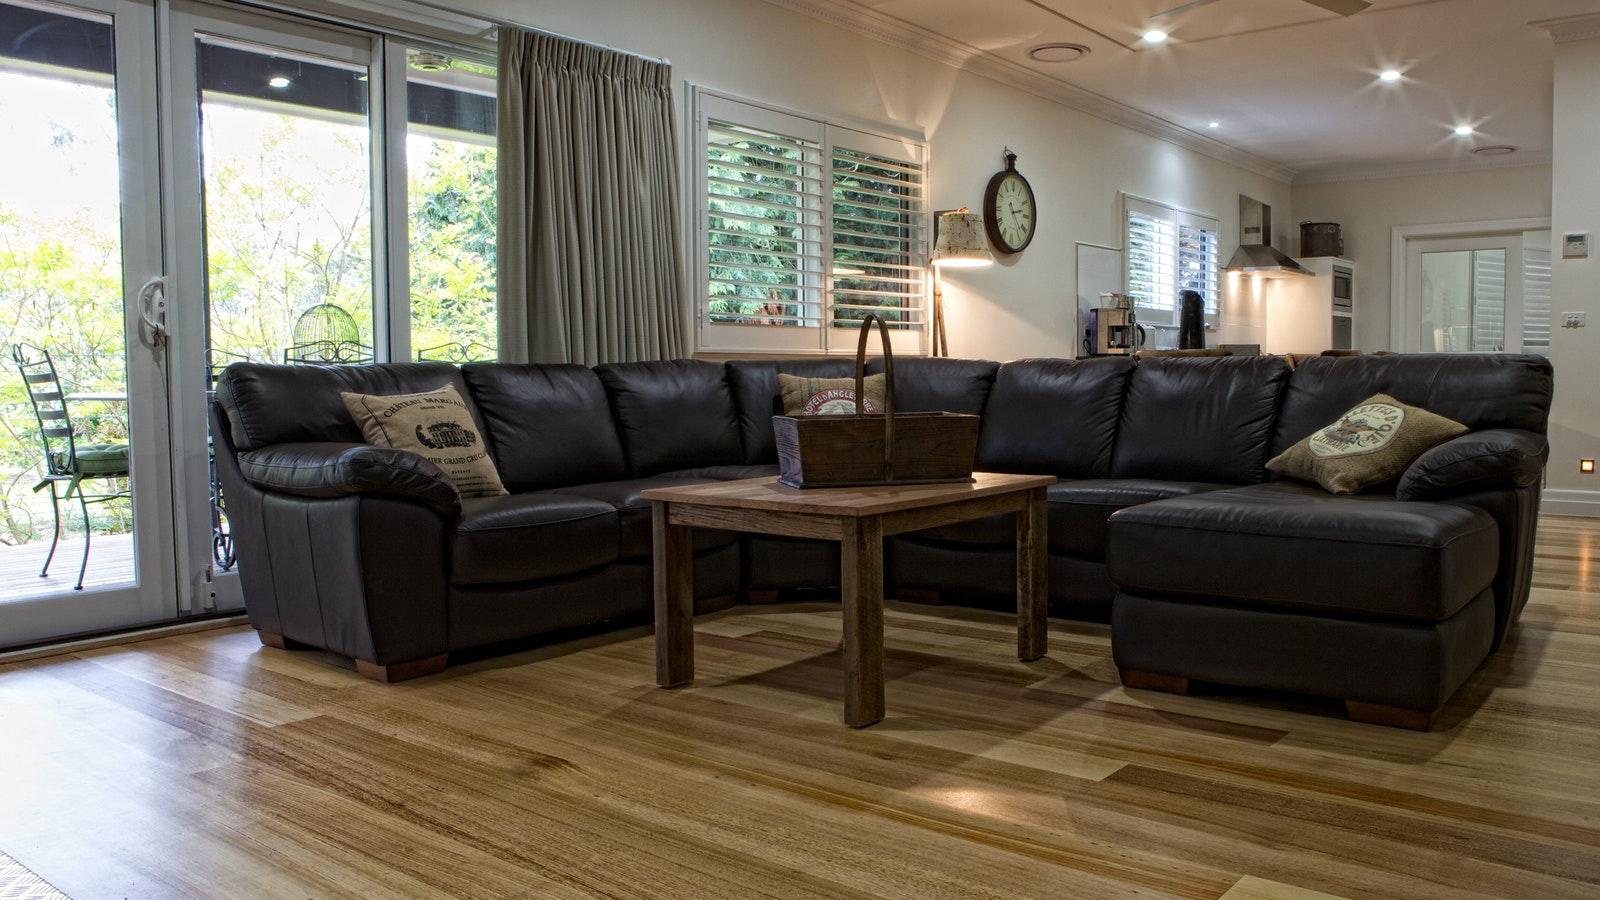 GGs Living room